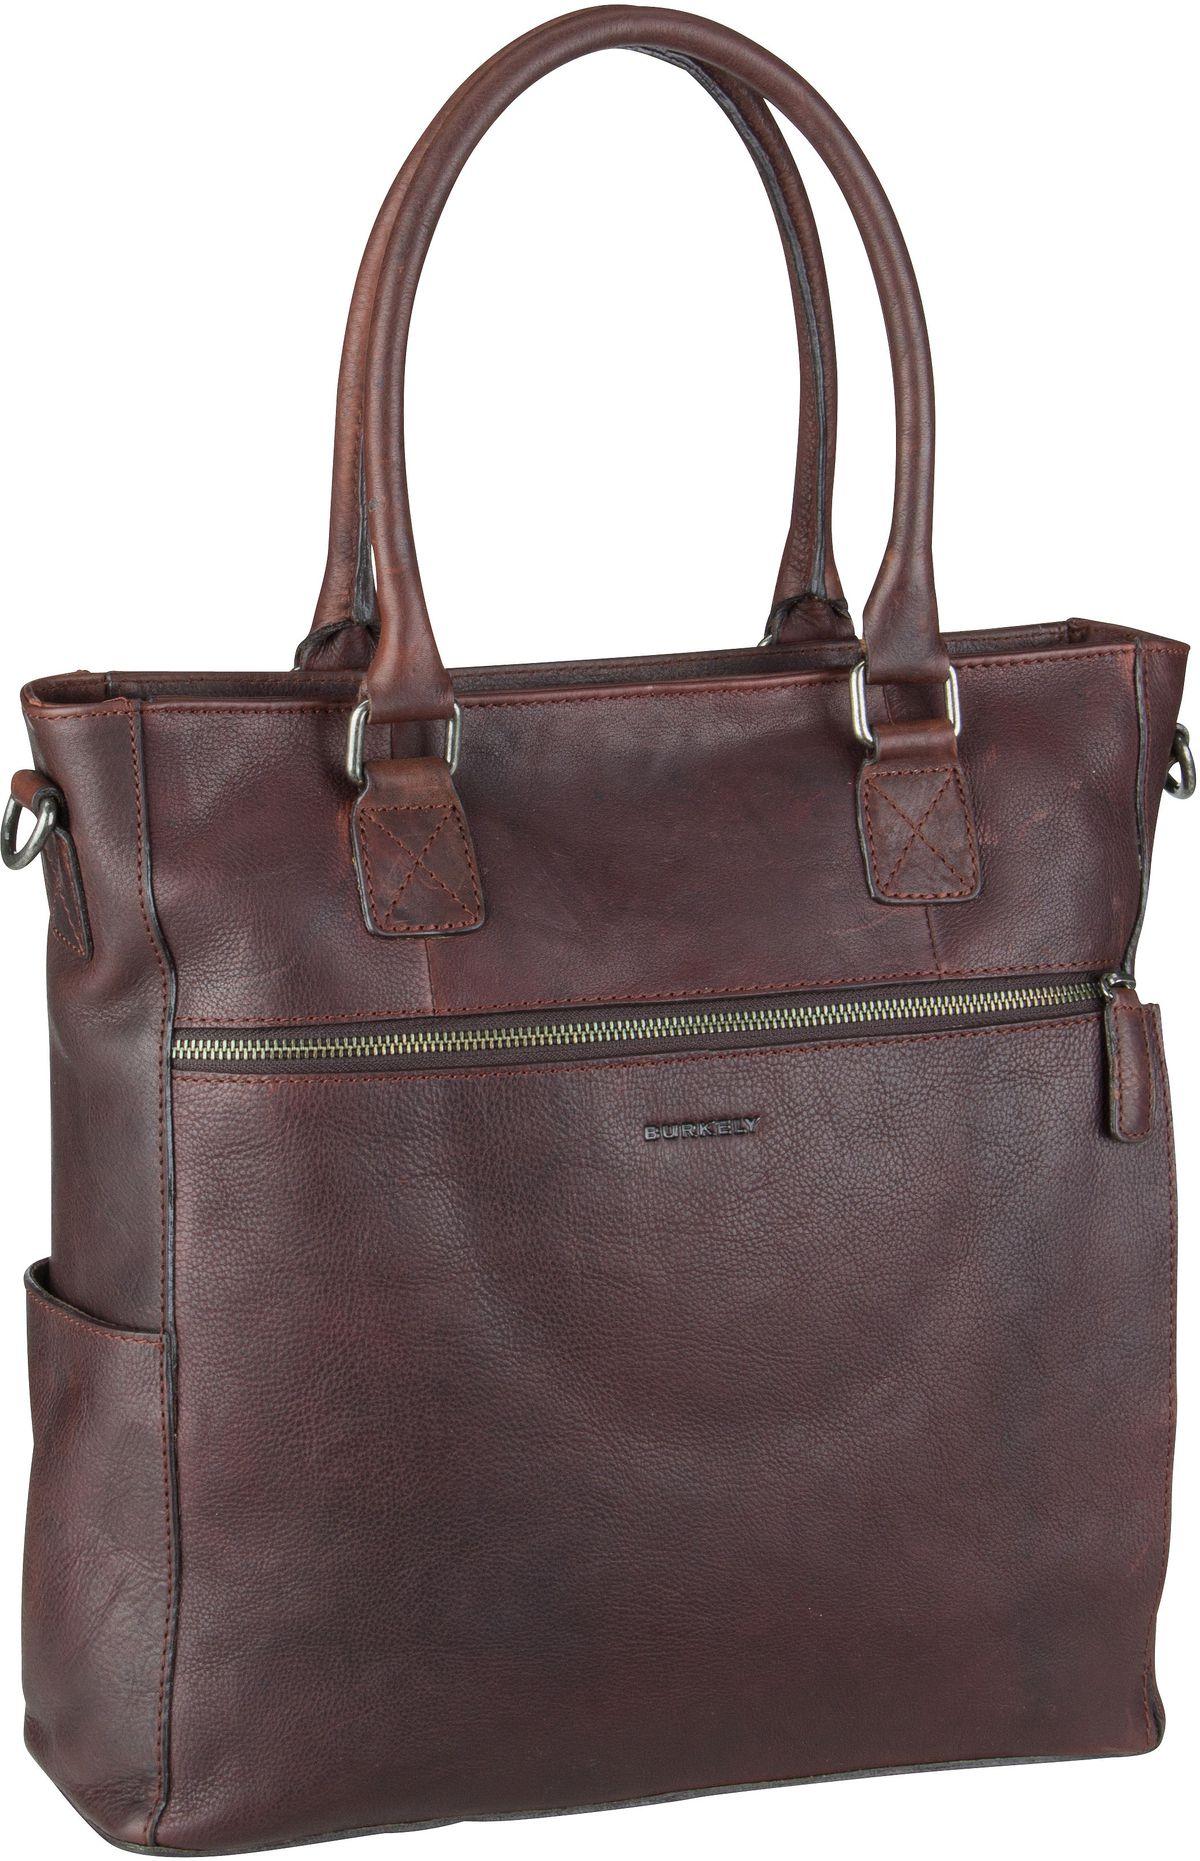 Burkely Handtasche Antique Avery Shopper 1756 Brown